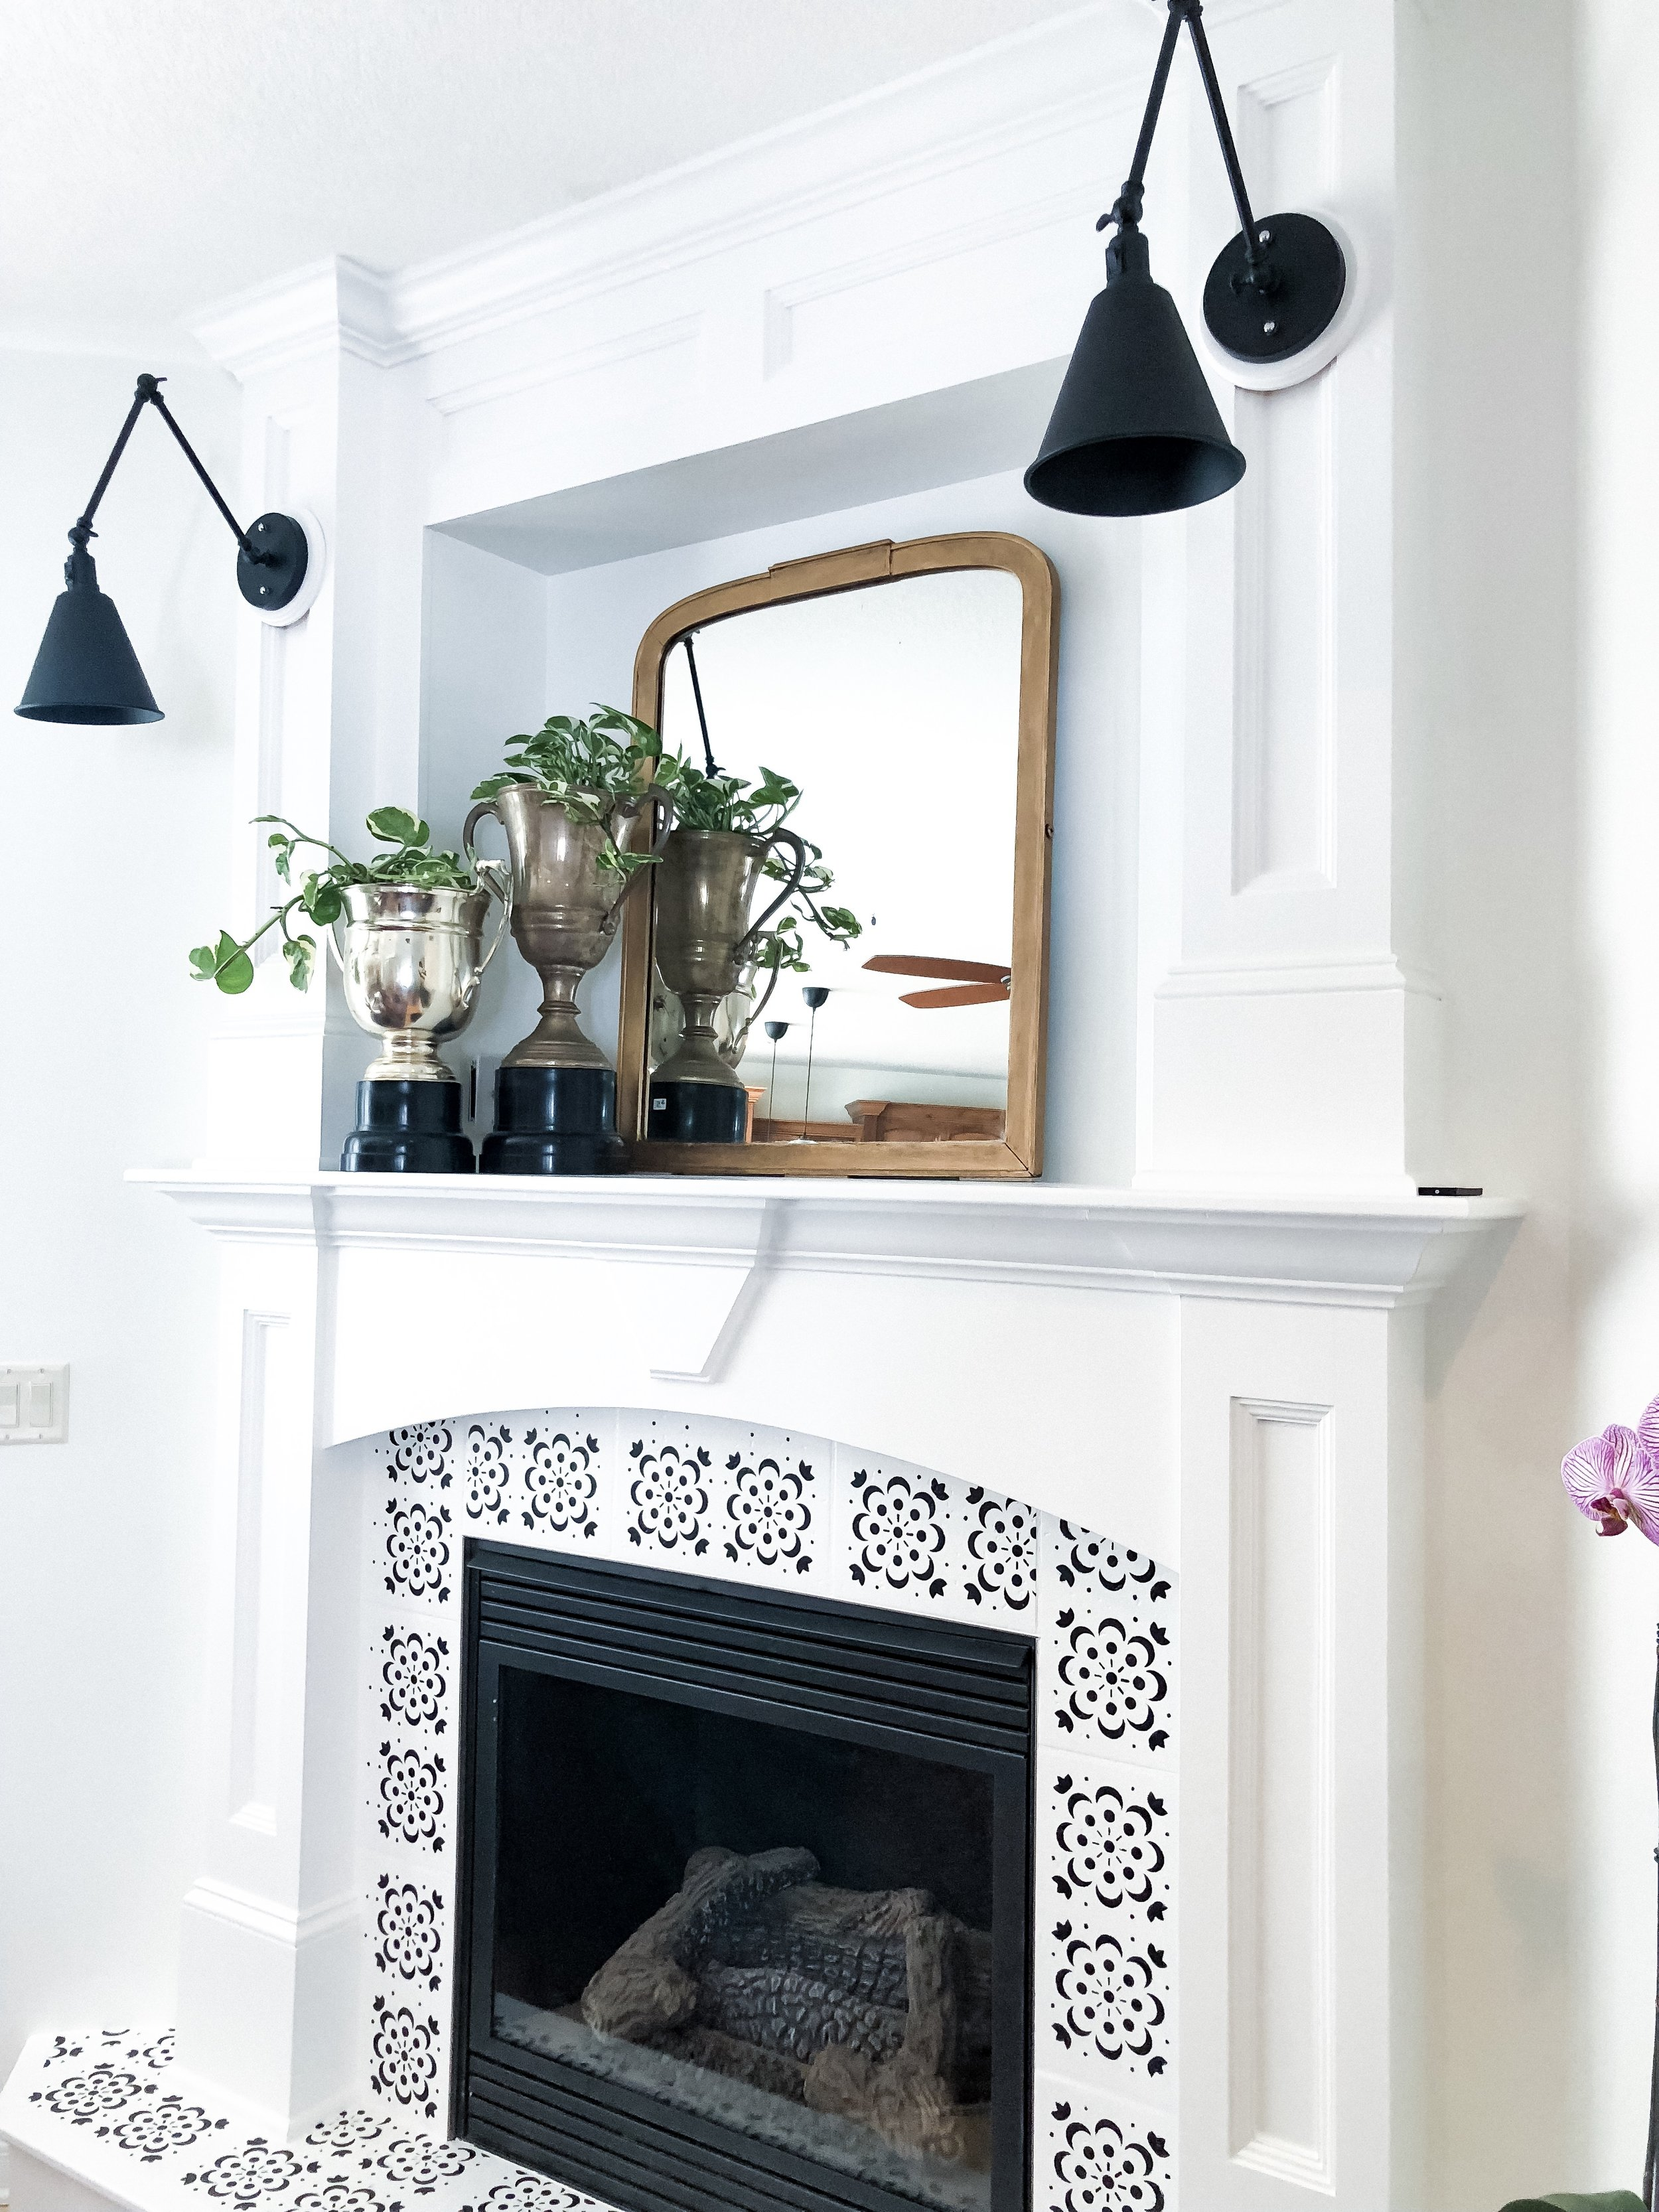 Magic Light Trick from hprallandco.com | H.Prall & Co. Interior Decorating